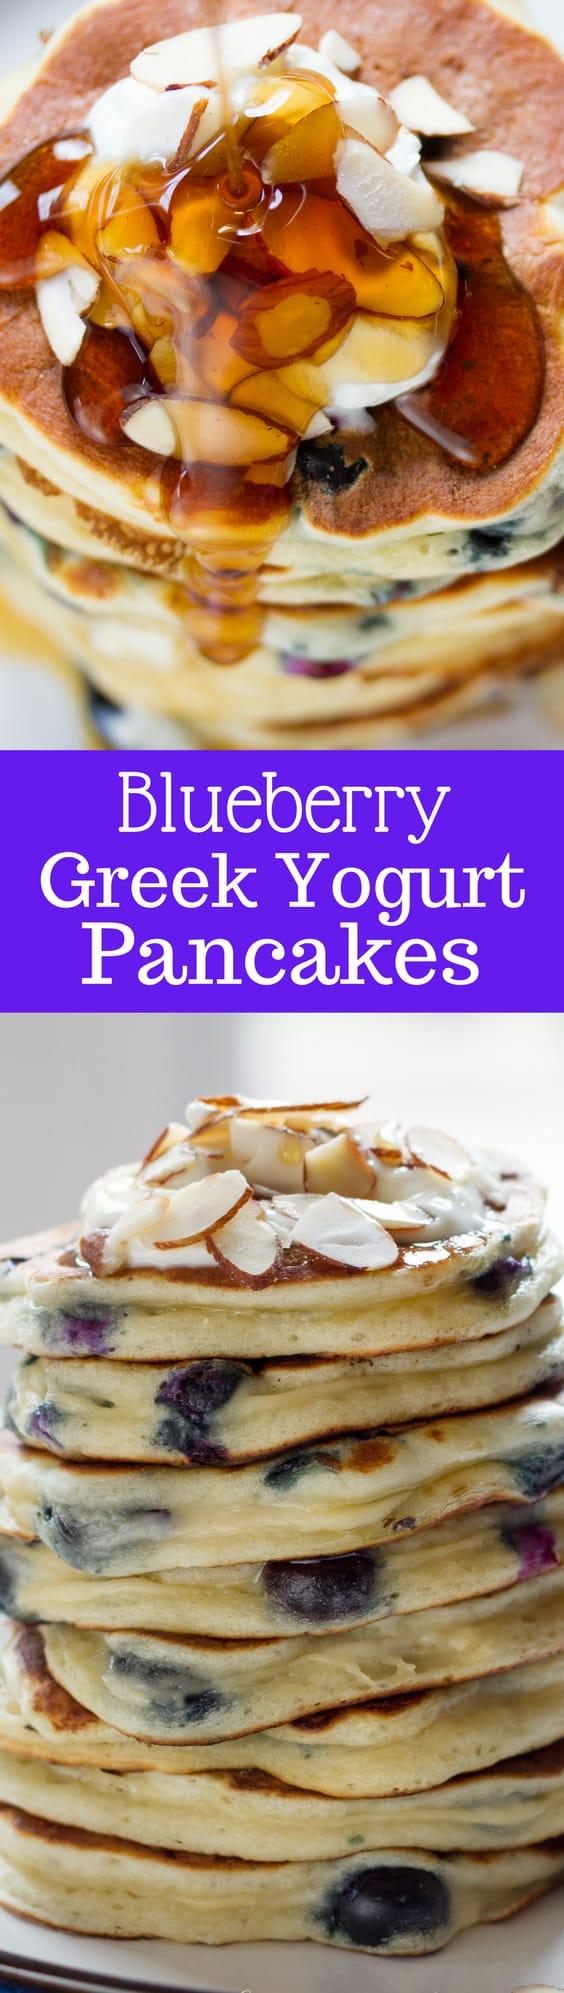 Fluffy Blueberry Greek Yogurt Pancakes ~ stuffed full of juicy ripe blueberries. A great way to start the day! www.savingdessert.com